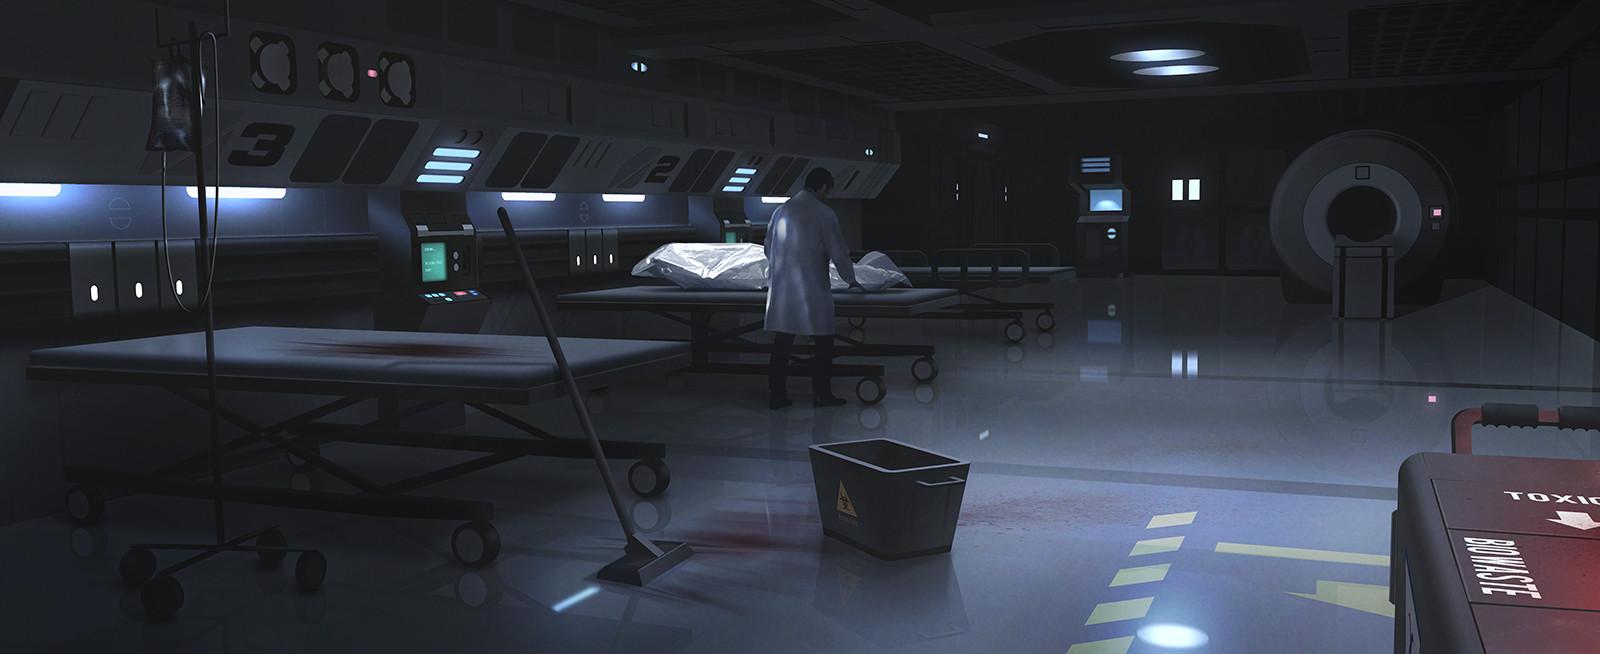 Medical Bay - 2013